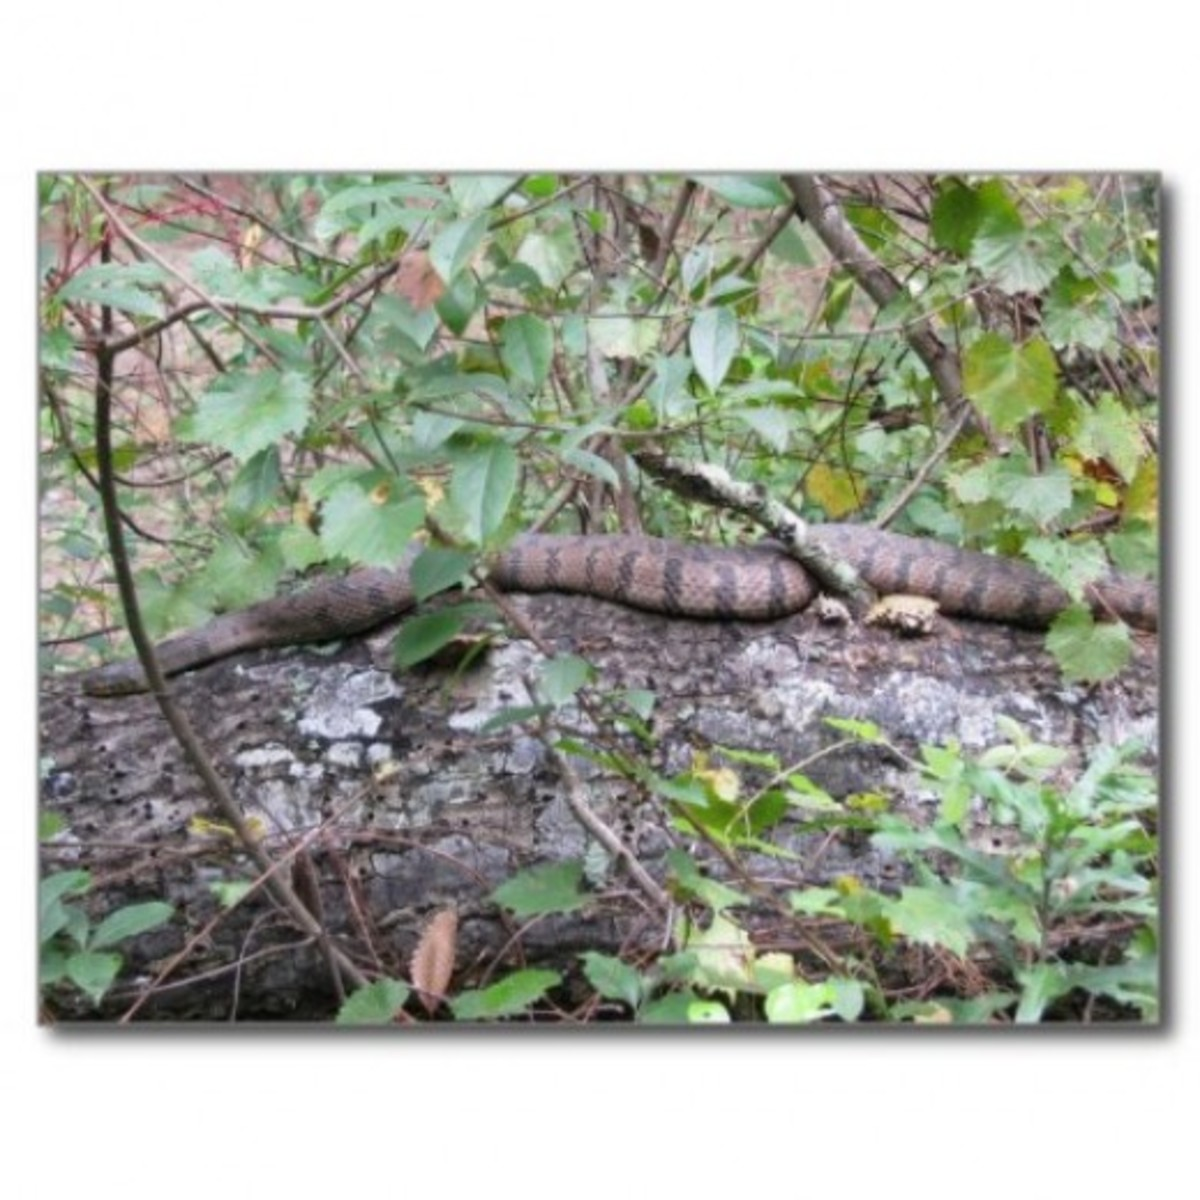 Snake on a log by naturegirl7 was taken after Hurricane Katrina.